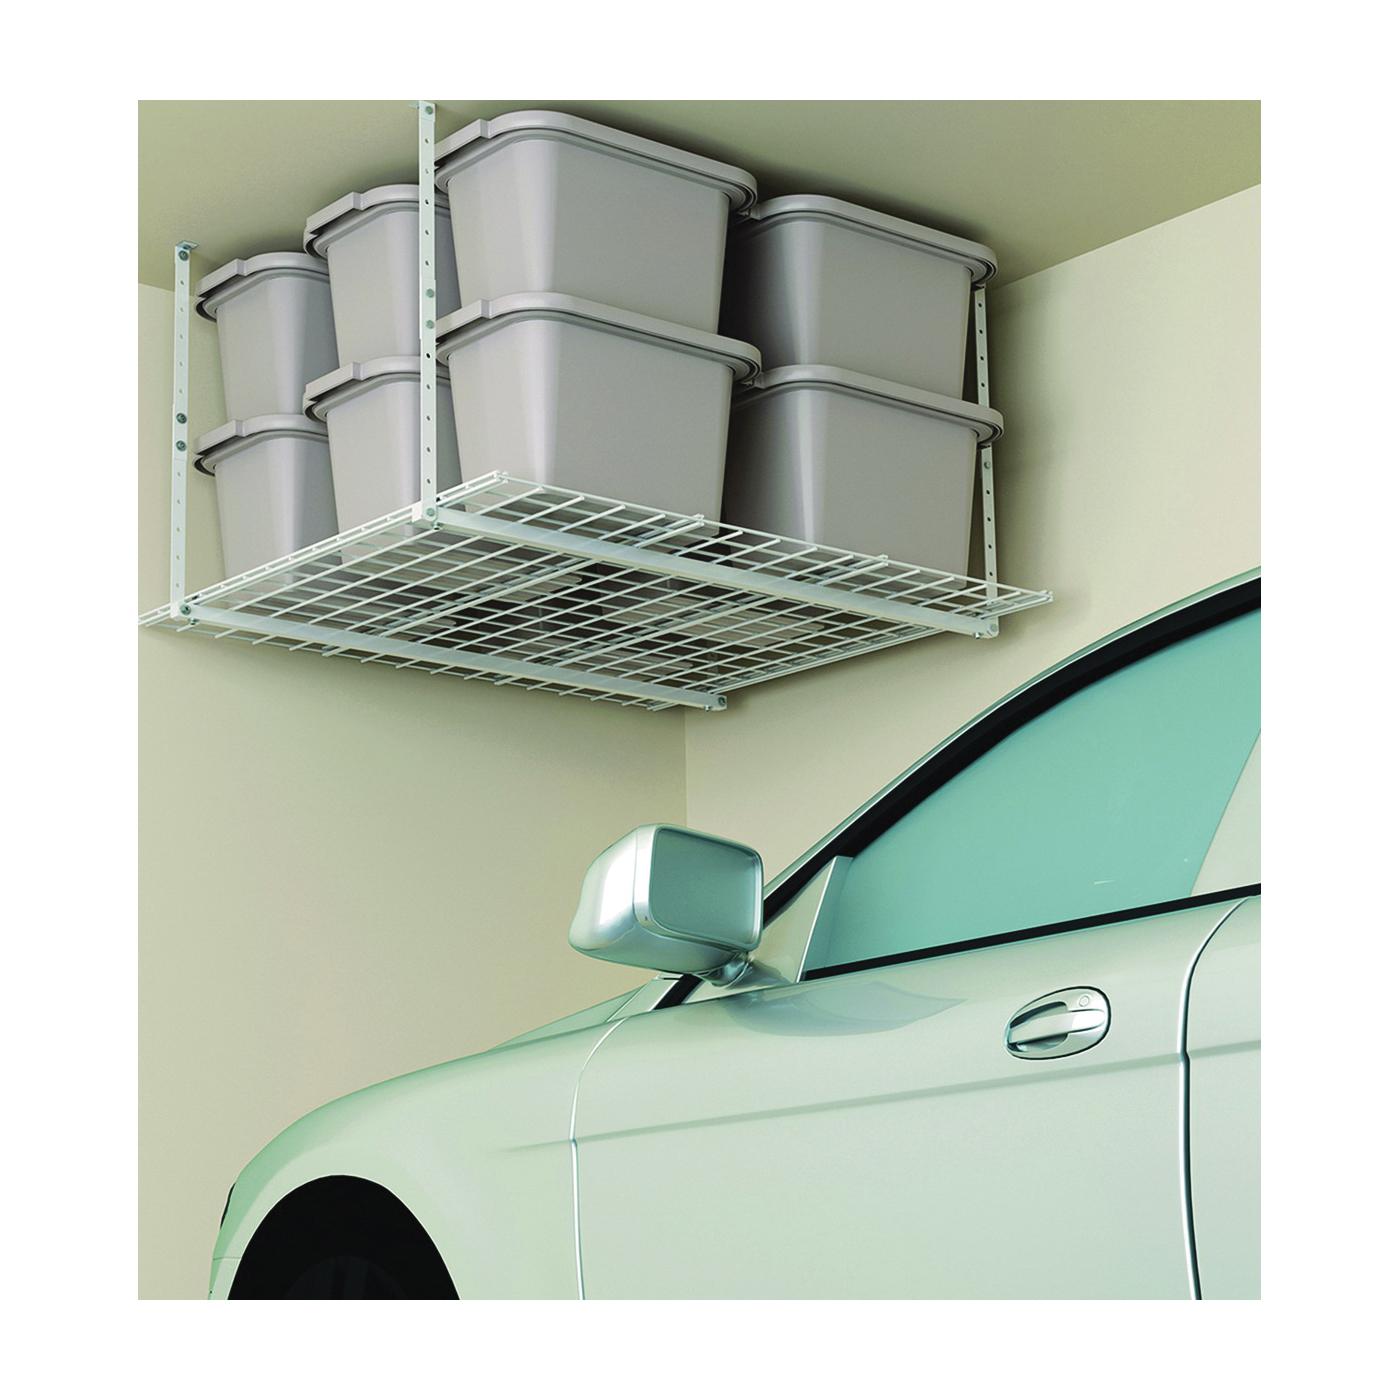 Picture of HyLoft 00540 Ceiling Storage Unit, 250 lb, Steel, White